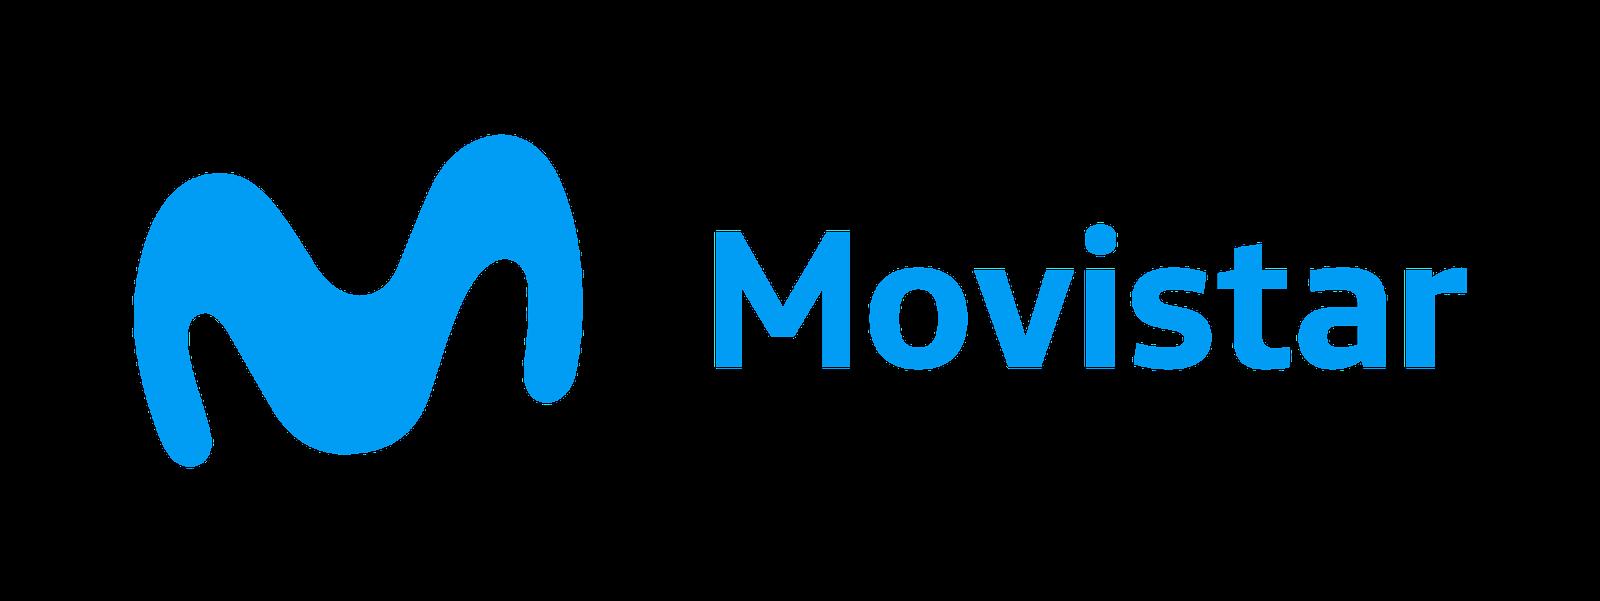 C:\Users\E10376\Desktop\logo movistar nuevo.png